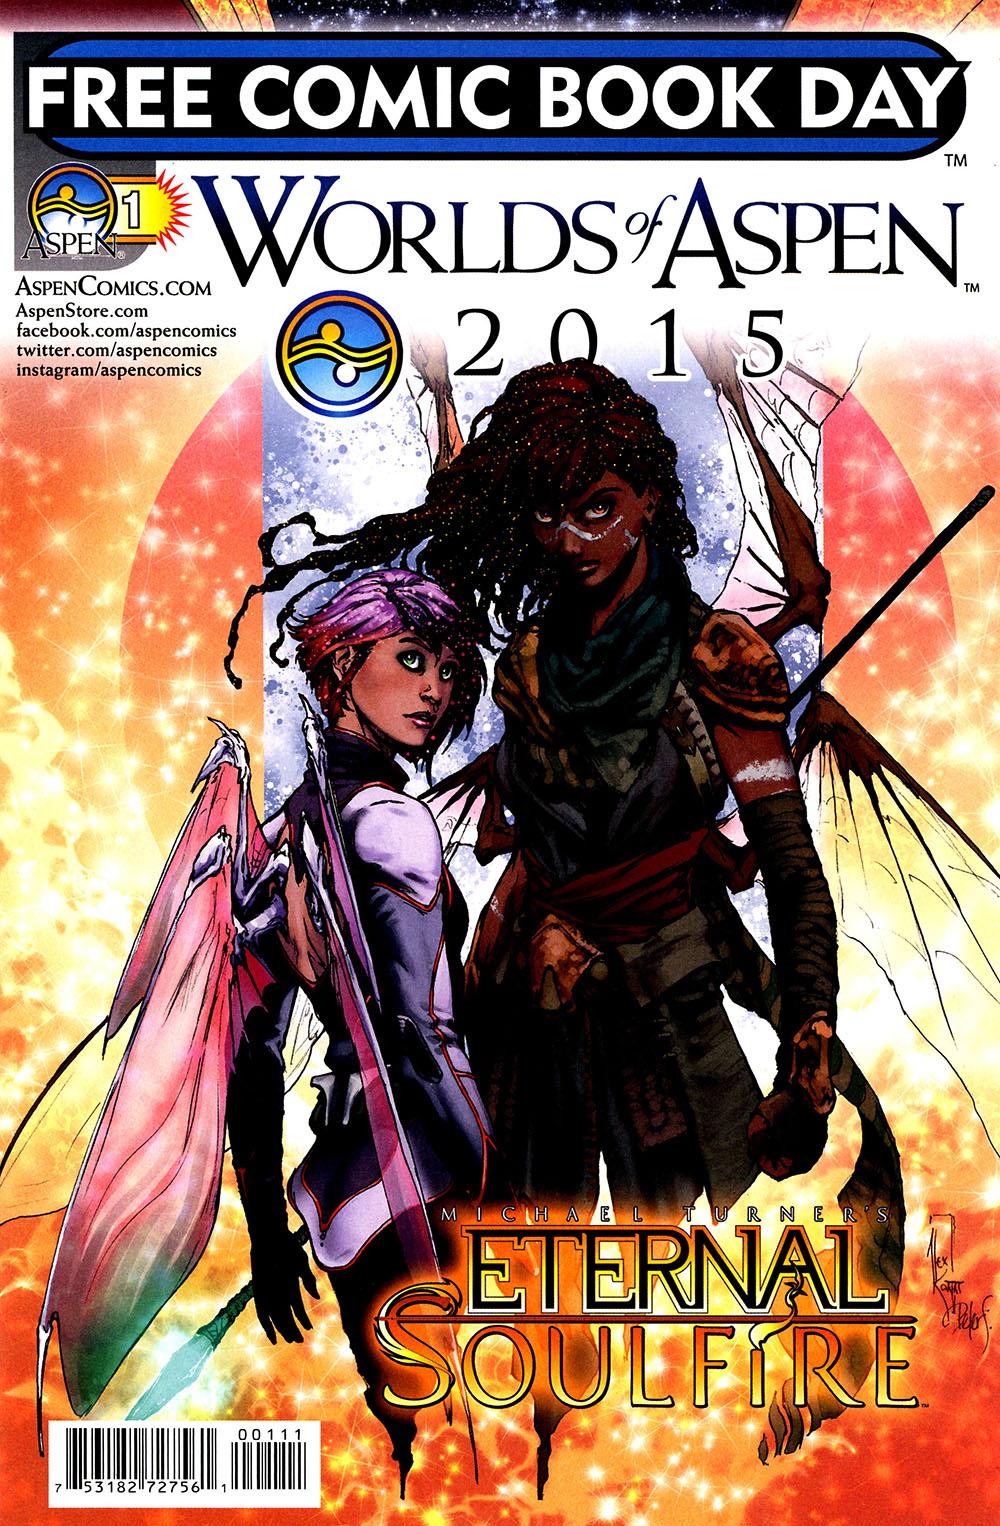 Free Comic Book Day 2015 – Worlds of Aspen | Viewcomic